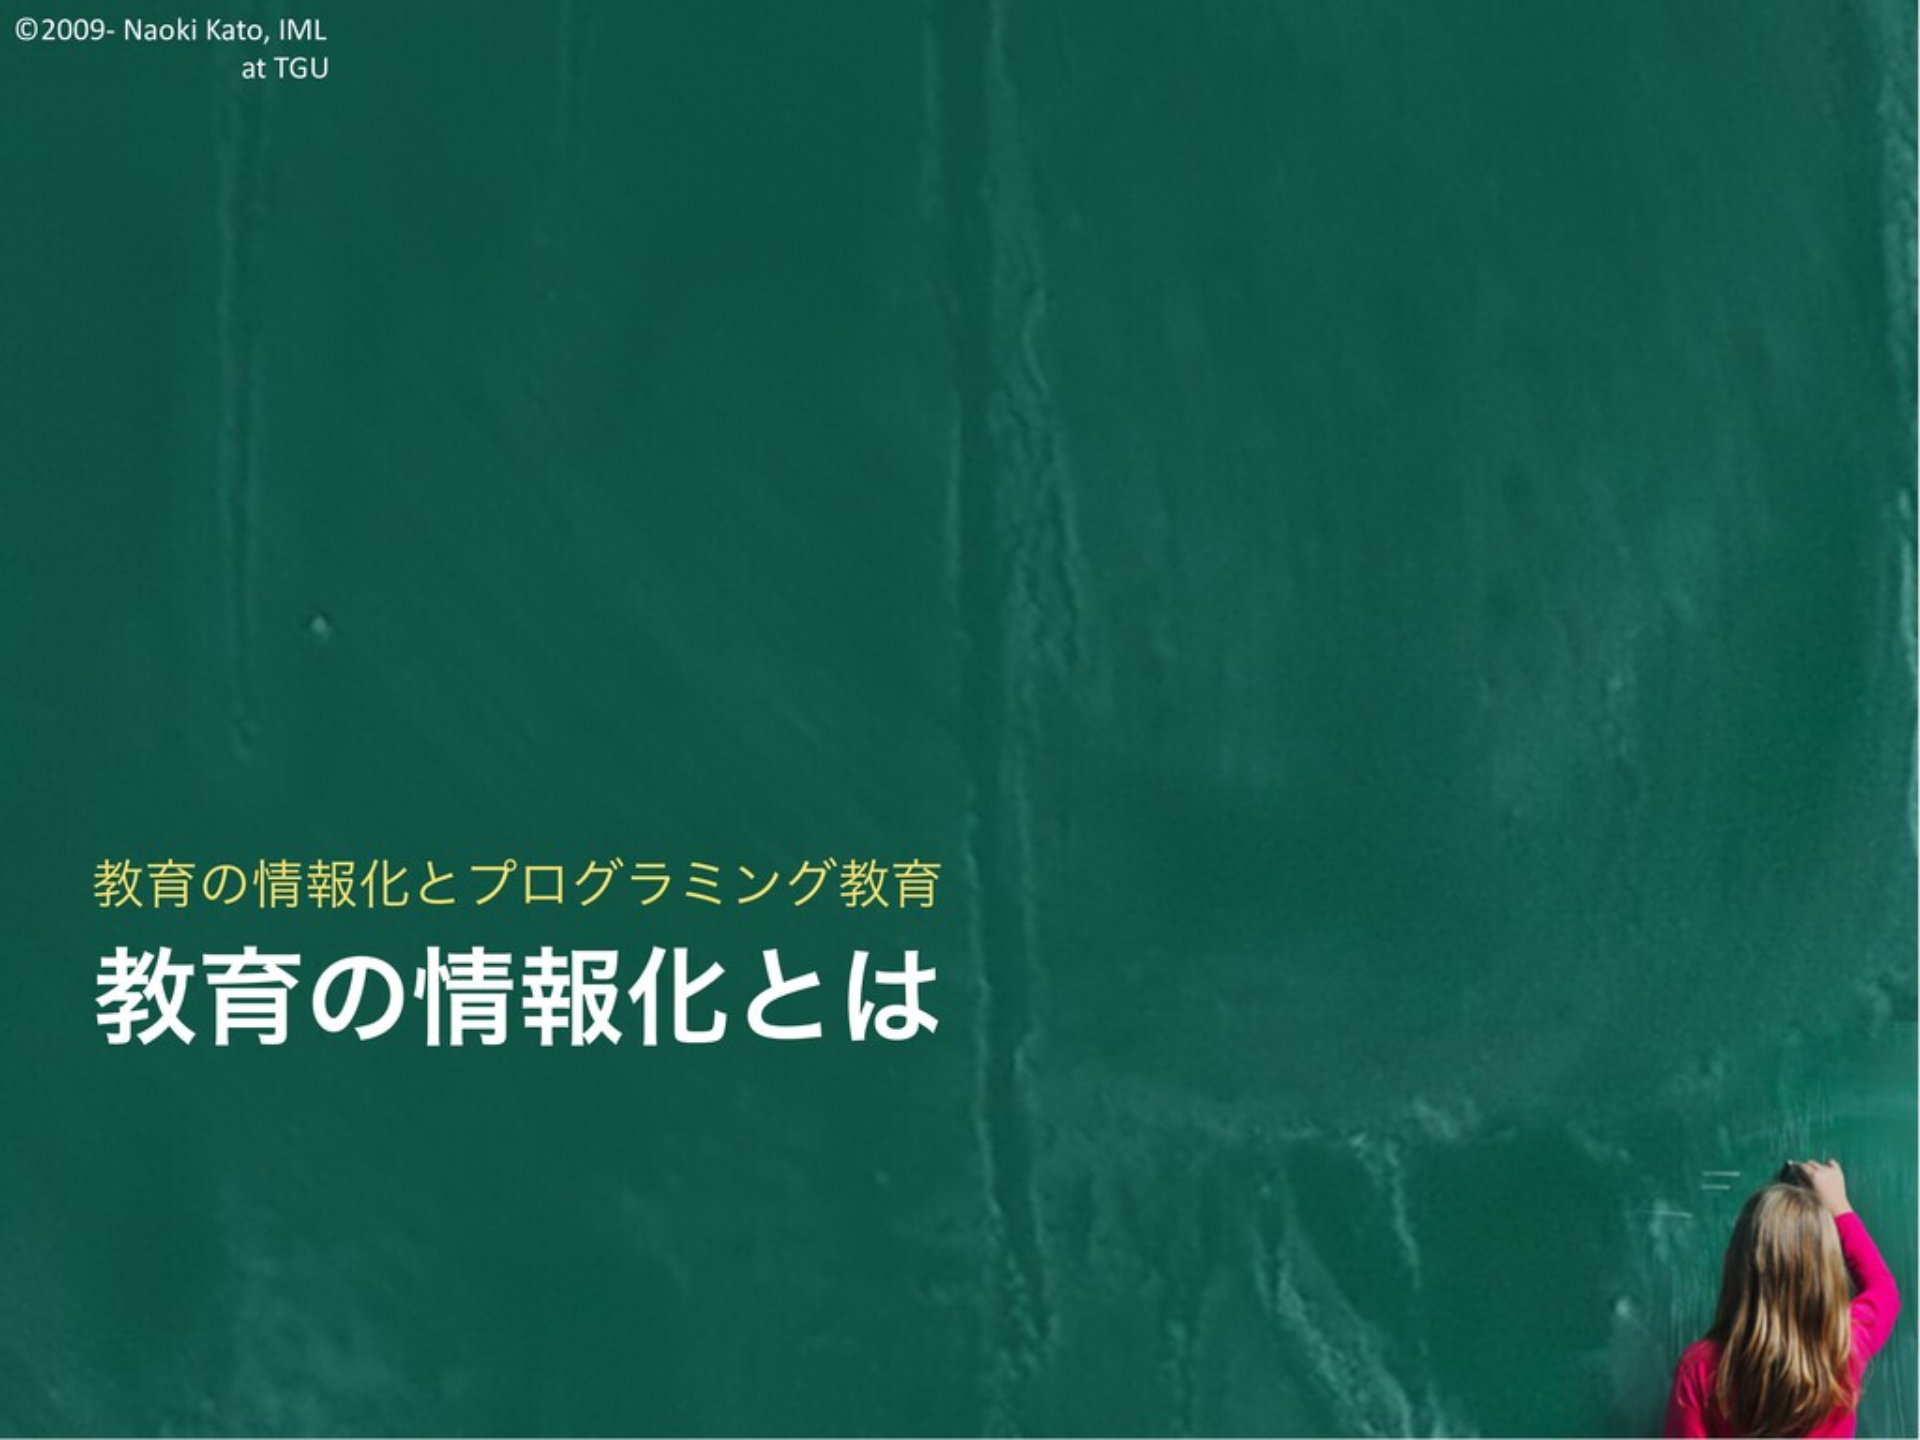 ©2009- Naoki Kato, IML at TGU 教育の情報化とは 教育の情報化とプ...